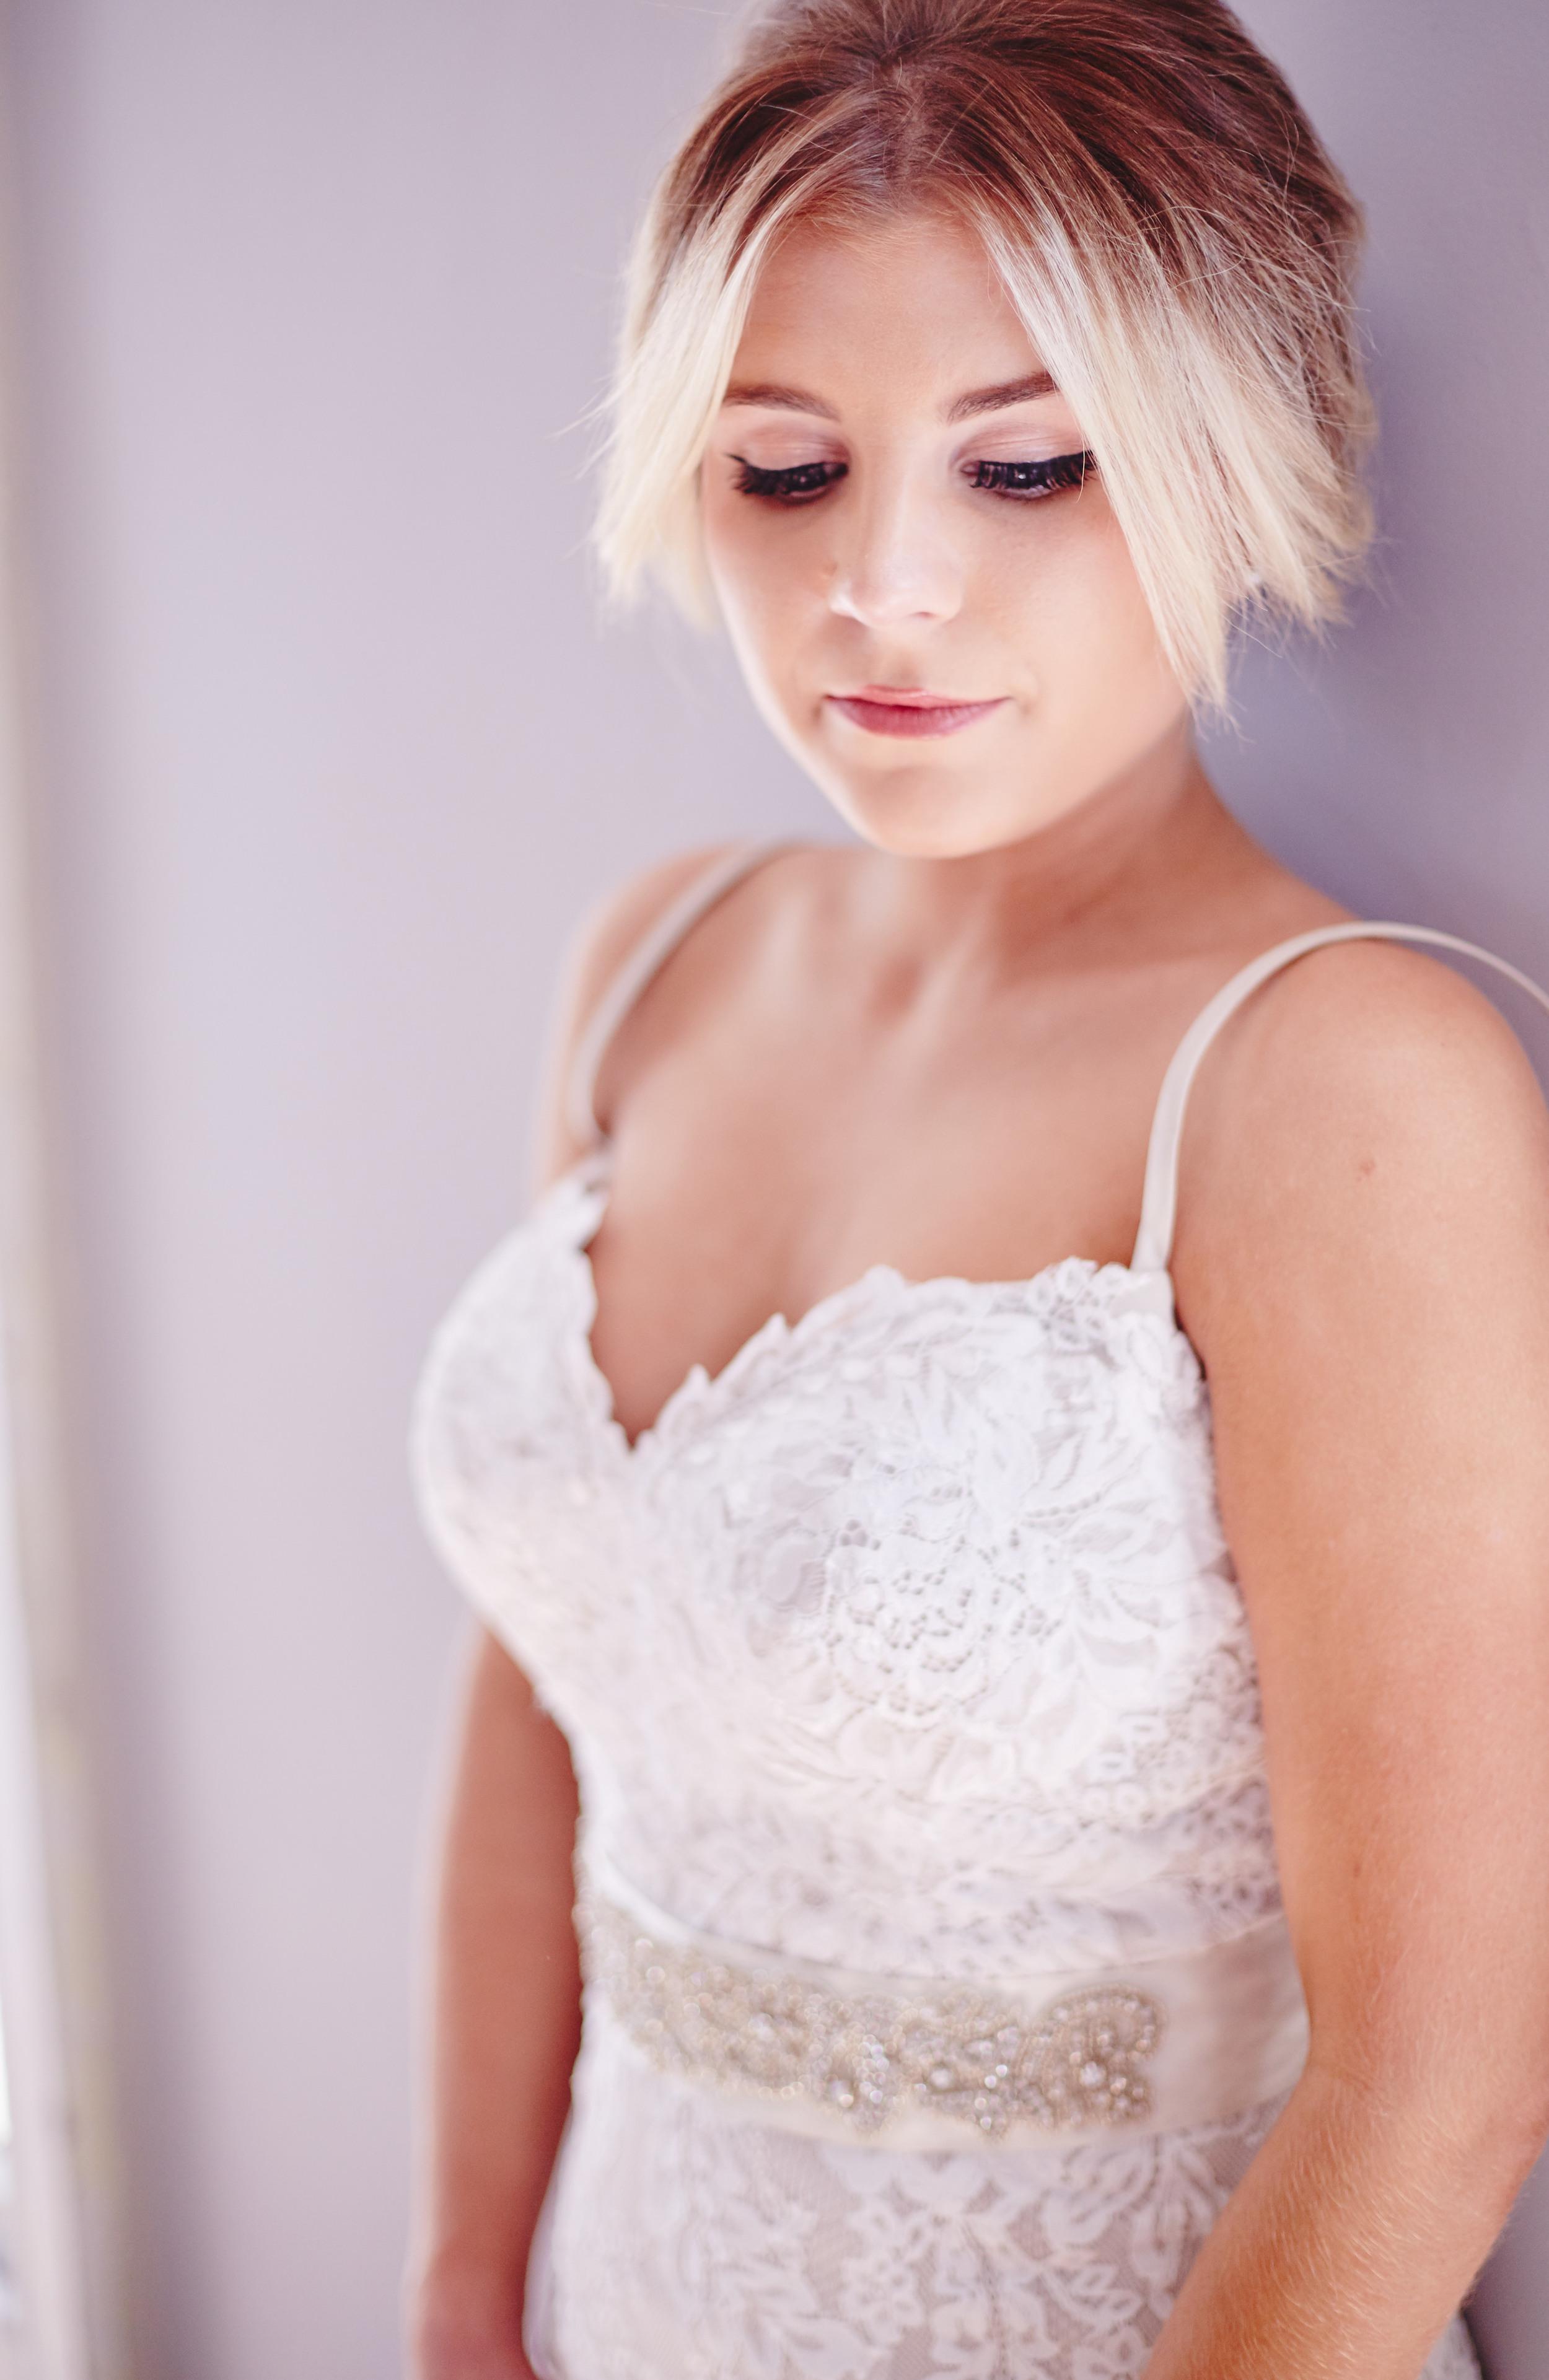 Styled_Session_Becca_Bridal_Portraits_Sarah_Tau_Photography_HOB_Studio_285 122.jpg